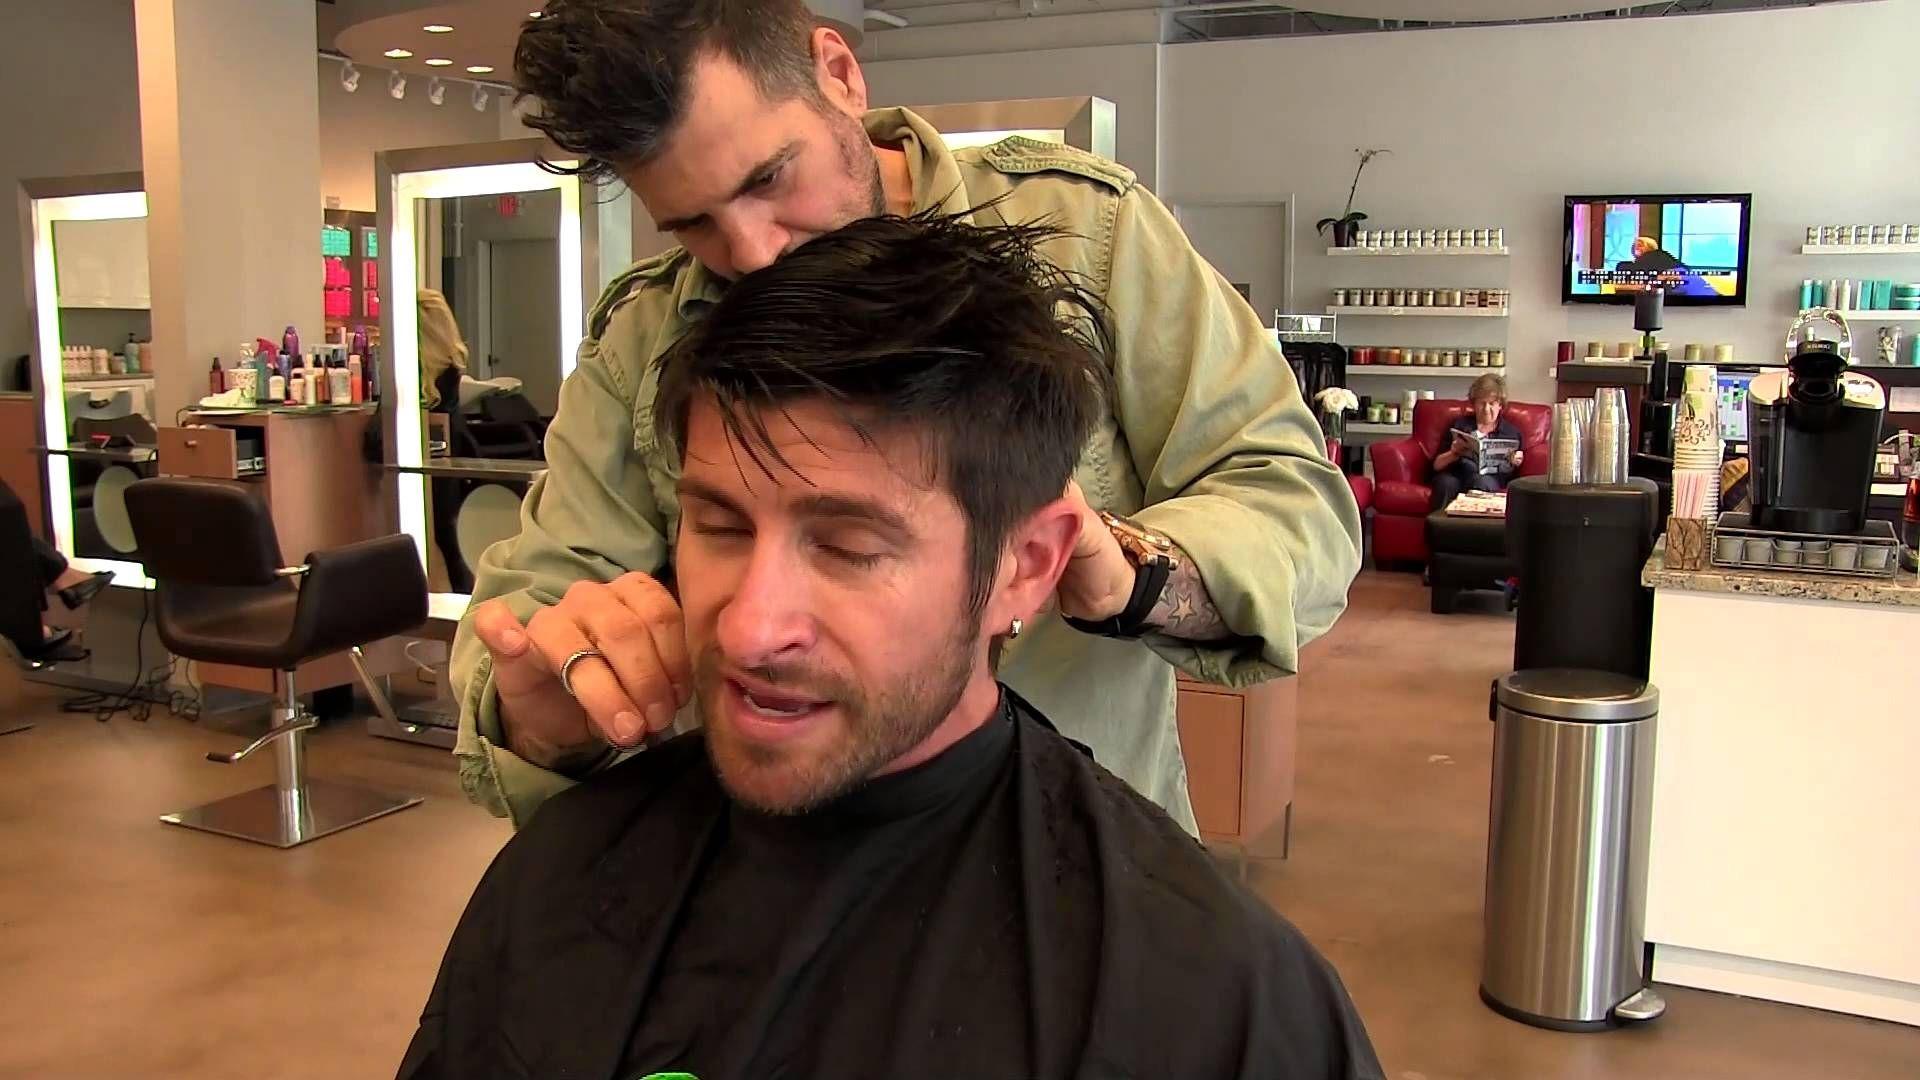 Boy hair style cutting mens hair care youtube ideas  hairstyle  pinterest  mens hair